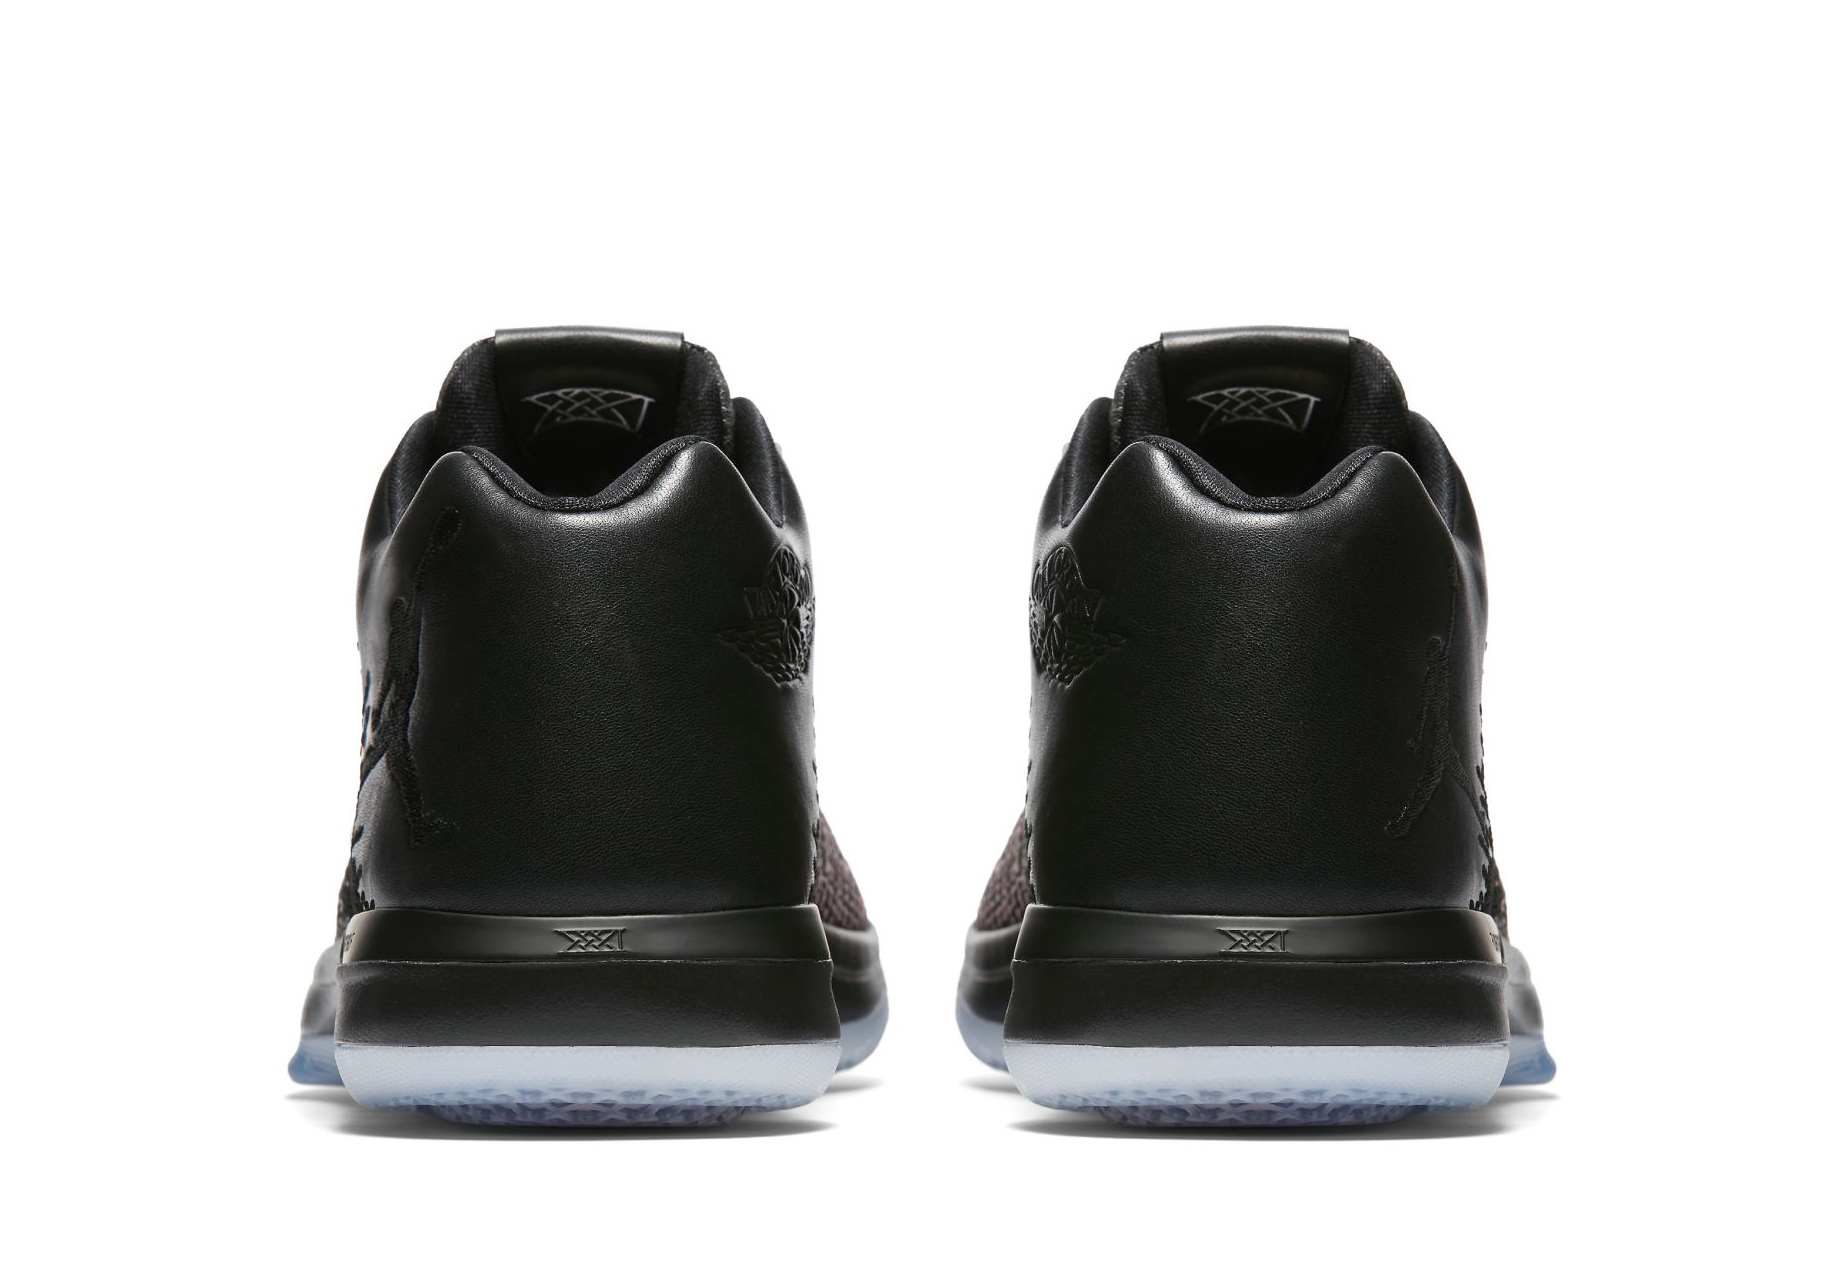 Jordan 31 black cat